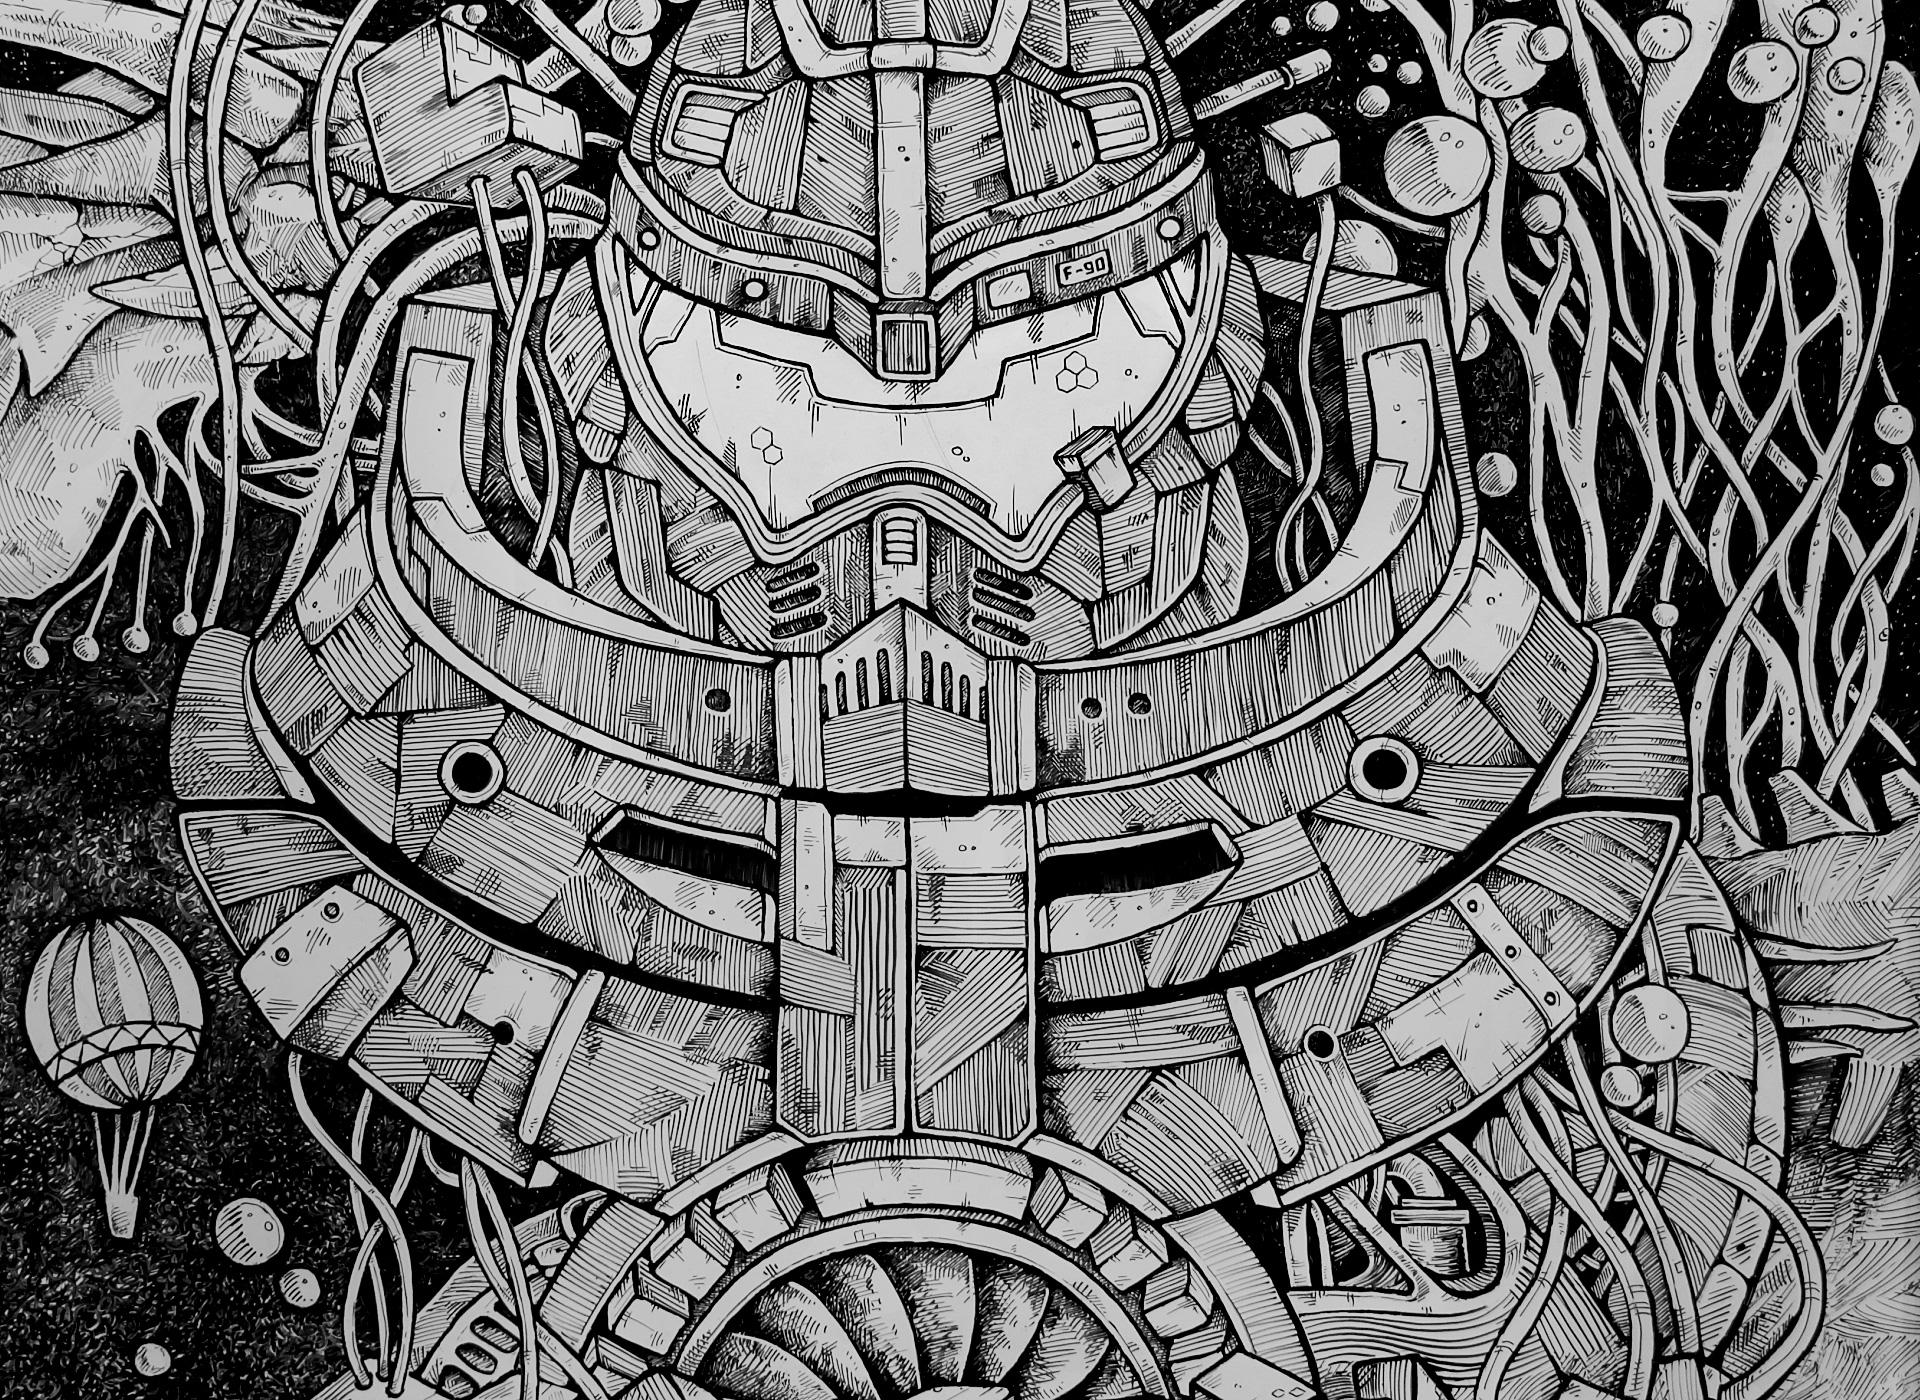 doodles13.jpg